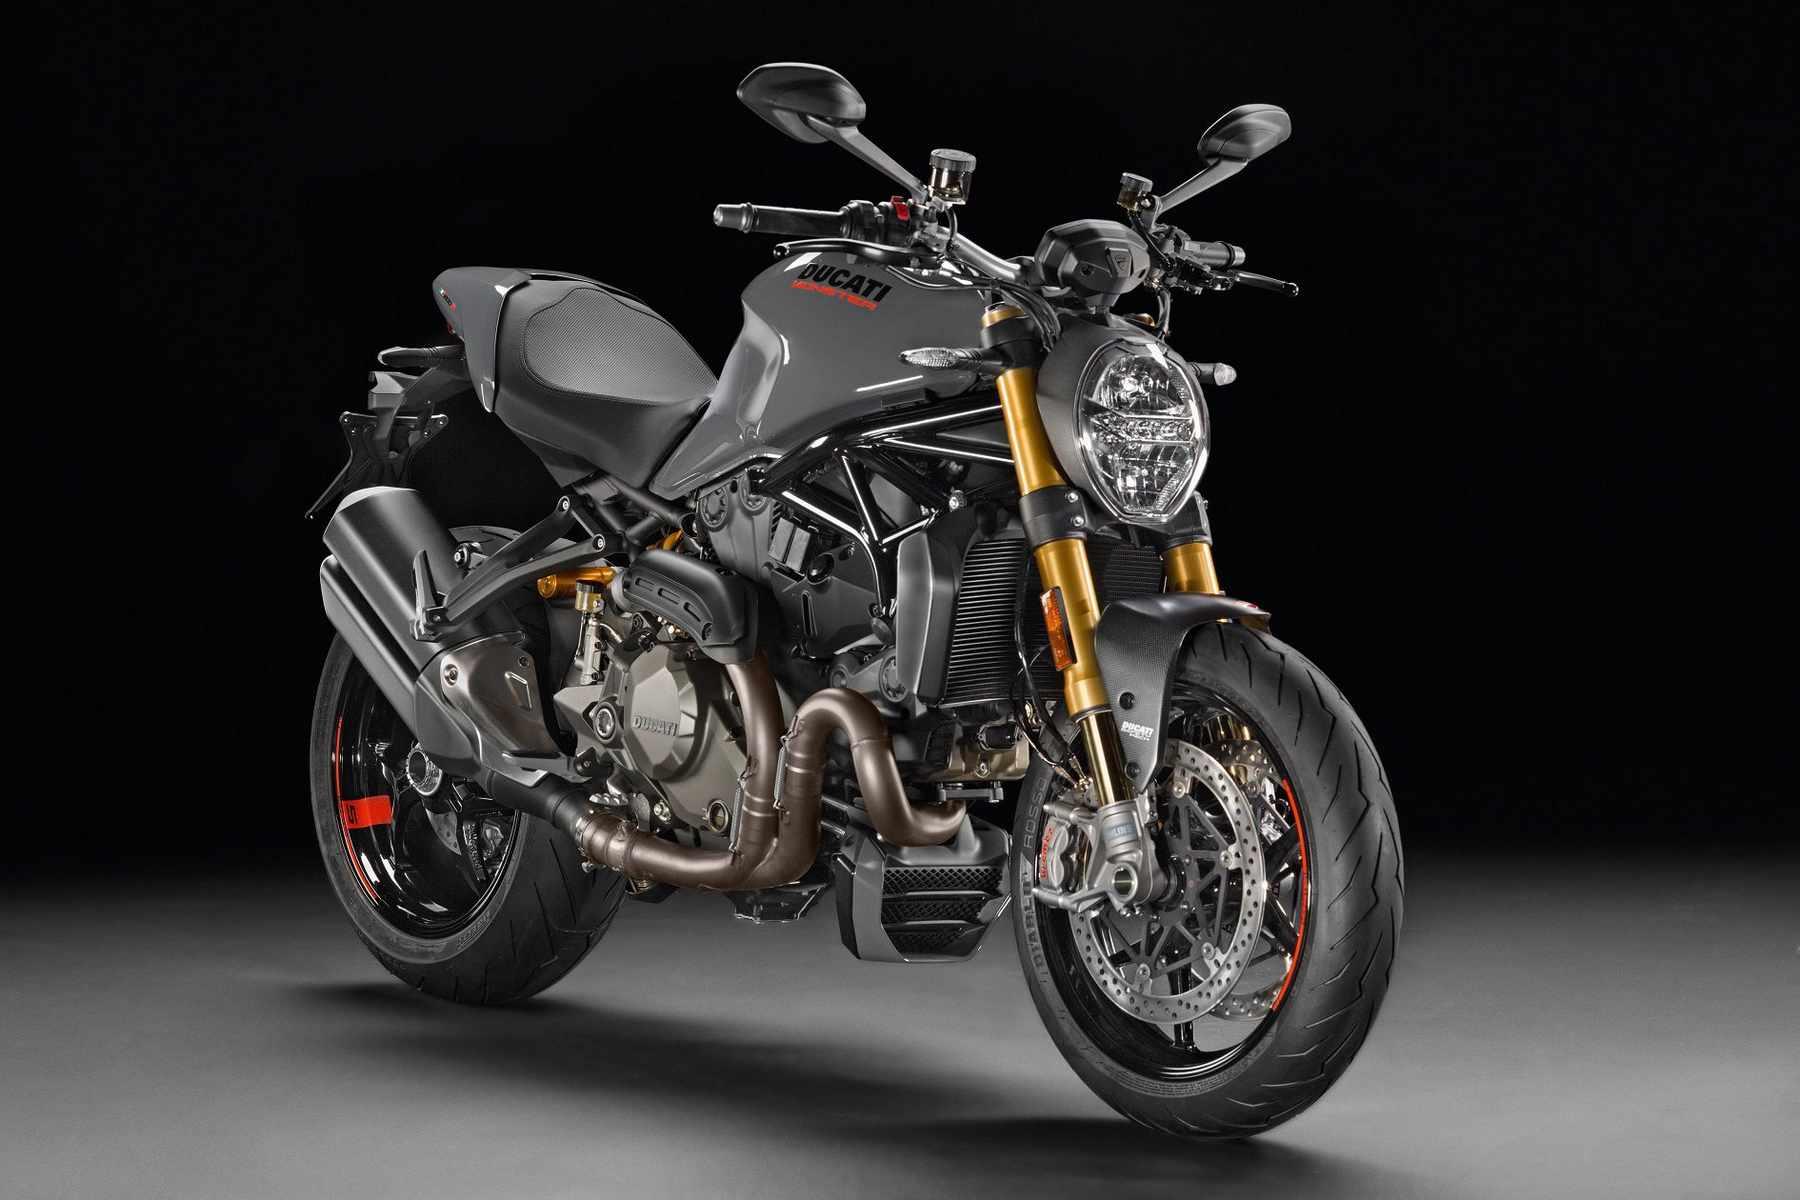 Nueva Ducati Monster 1200 / S 2017